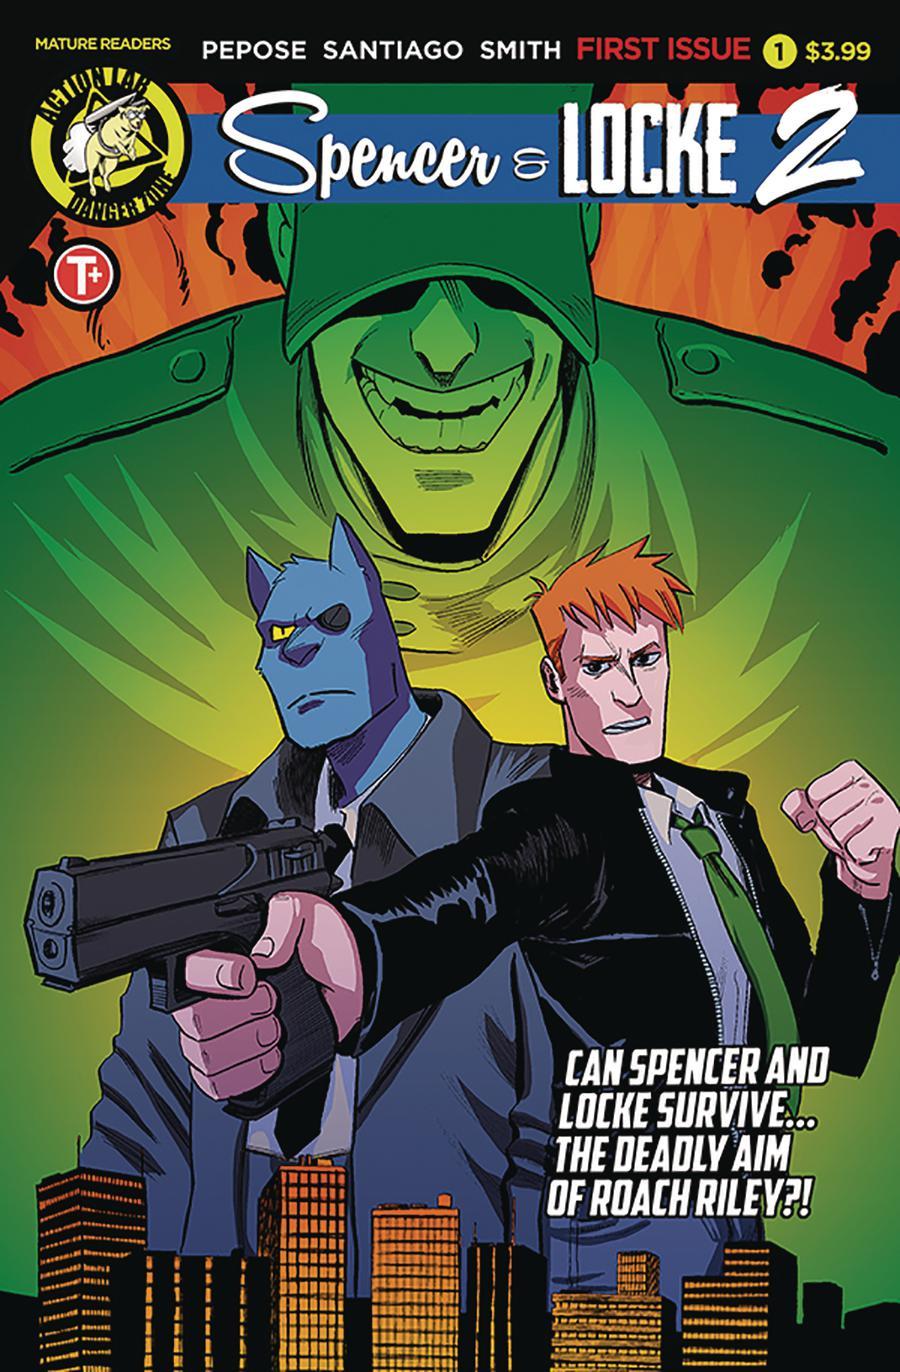 Spencer & Locke Vol 2 #1 Cover A Regular Jorge Santiago Jr Cover